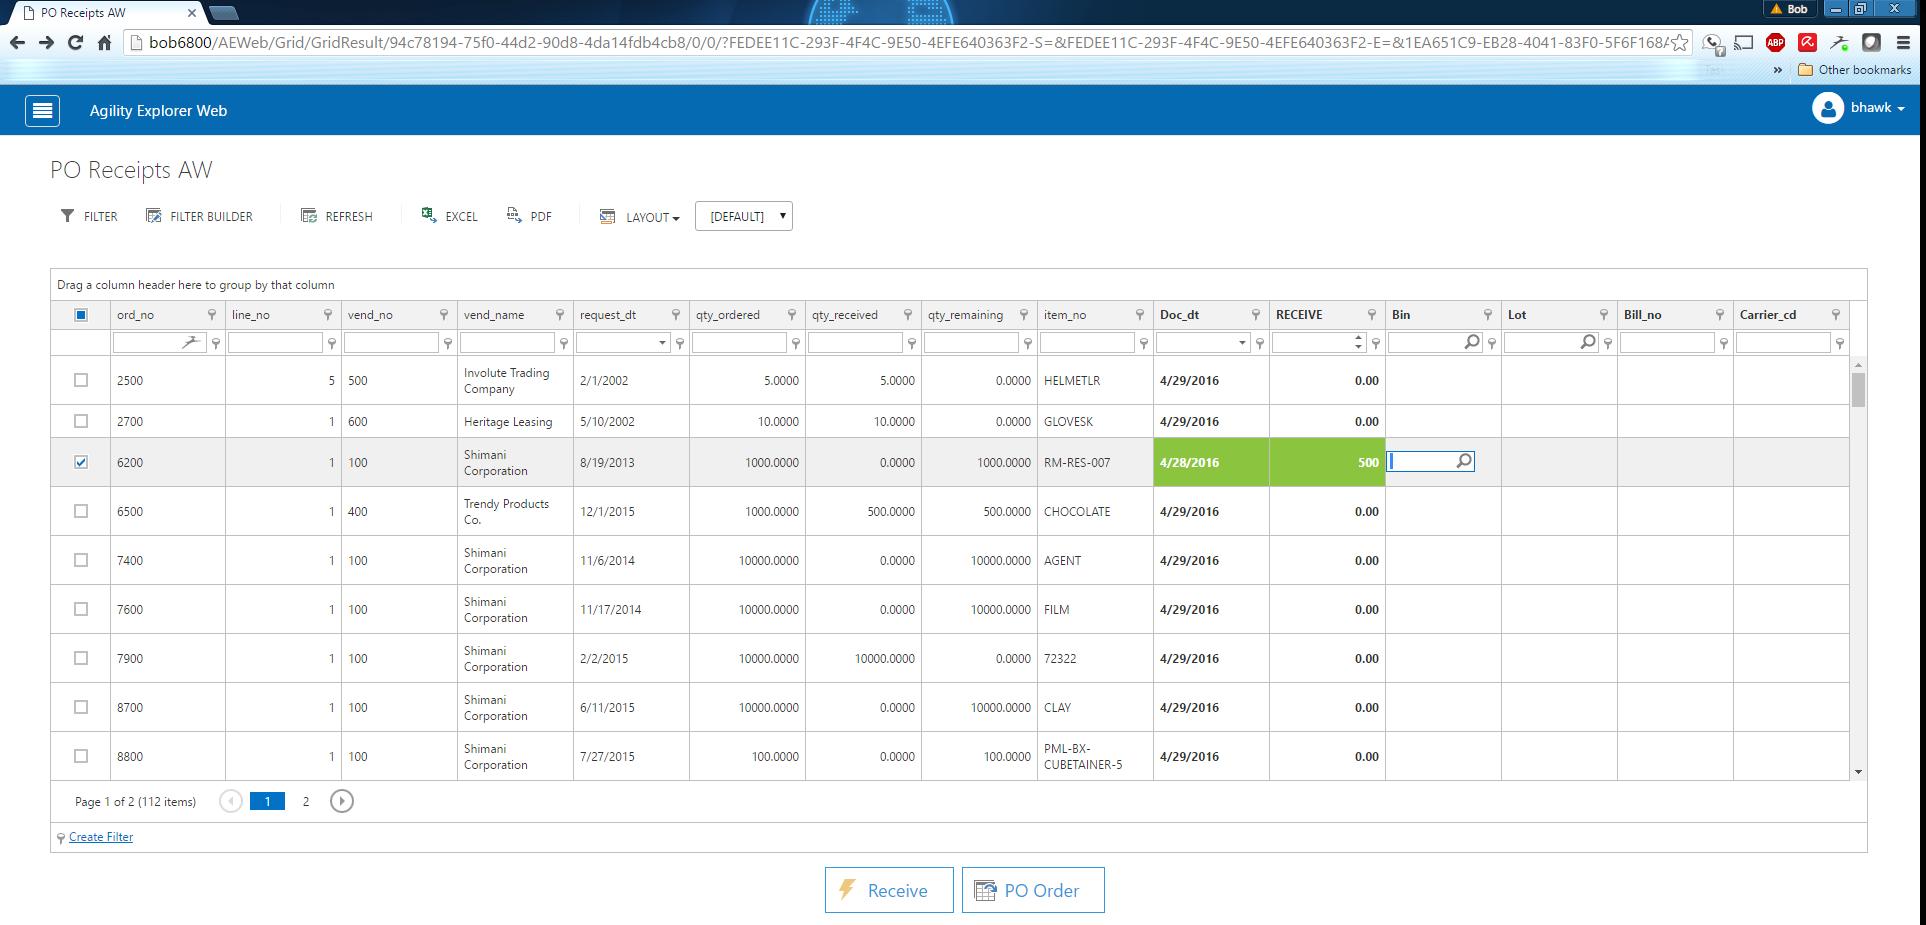 WiSys Agility Web Explorer Webinar